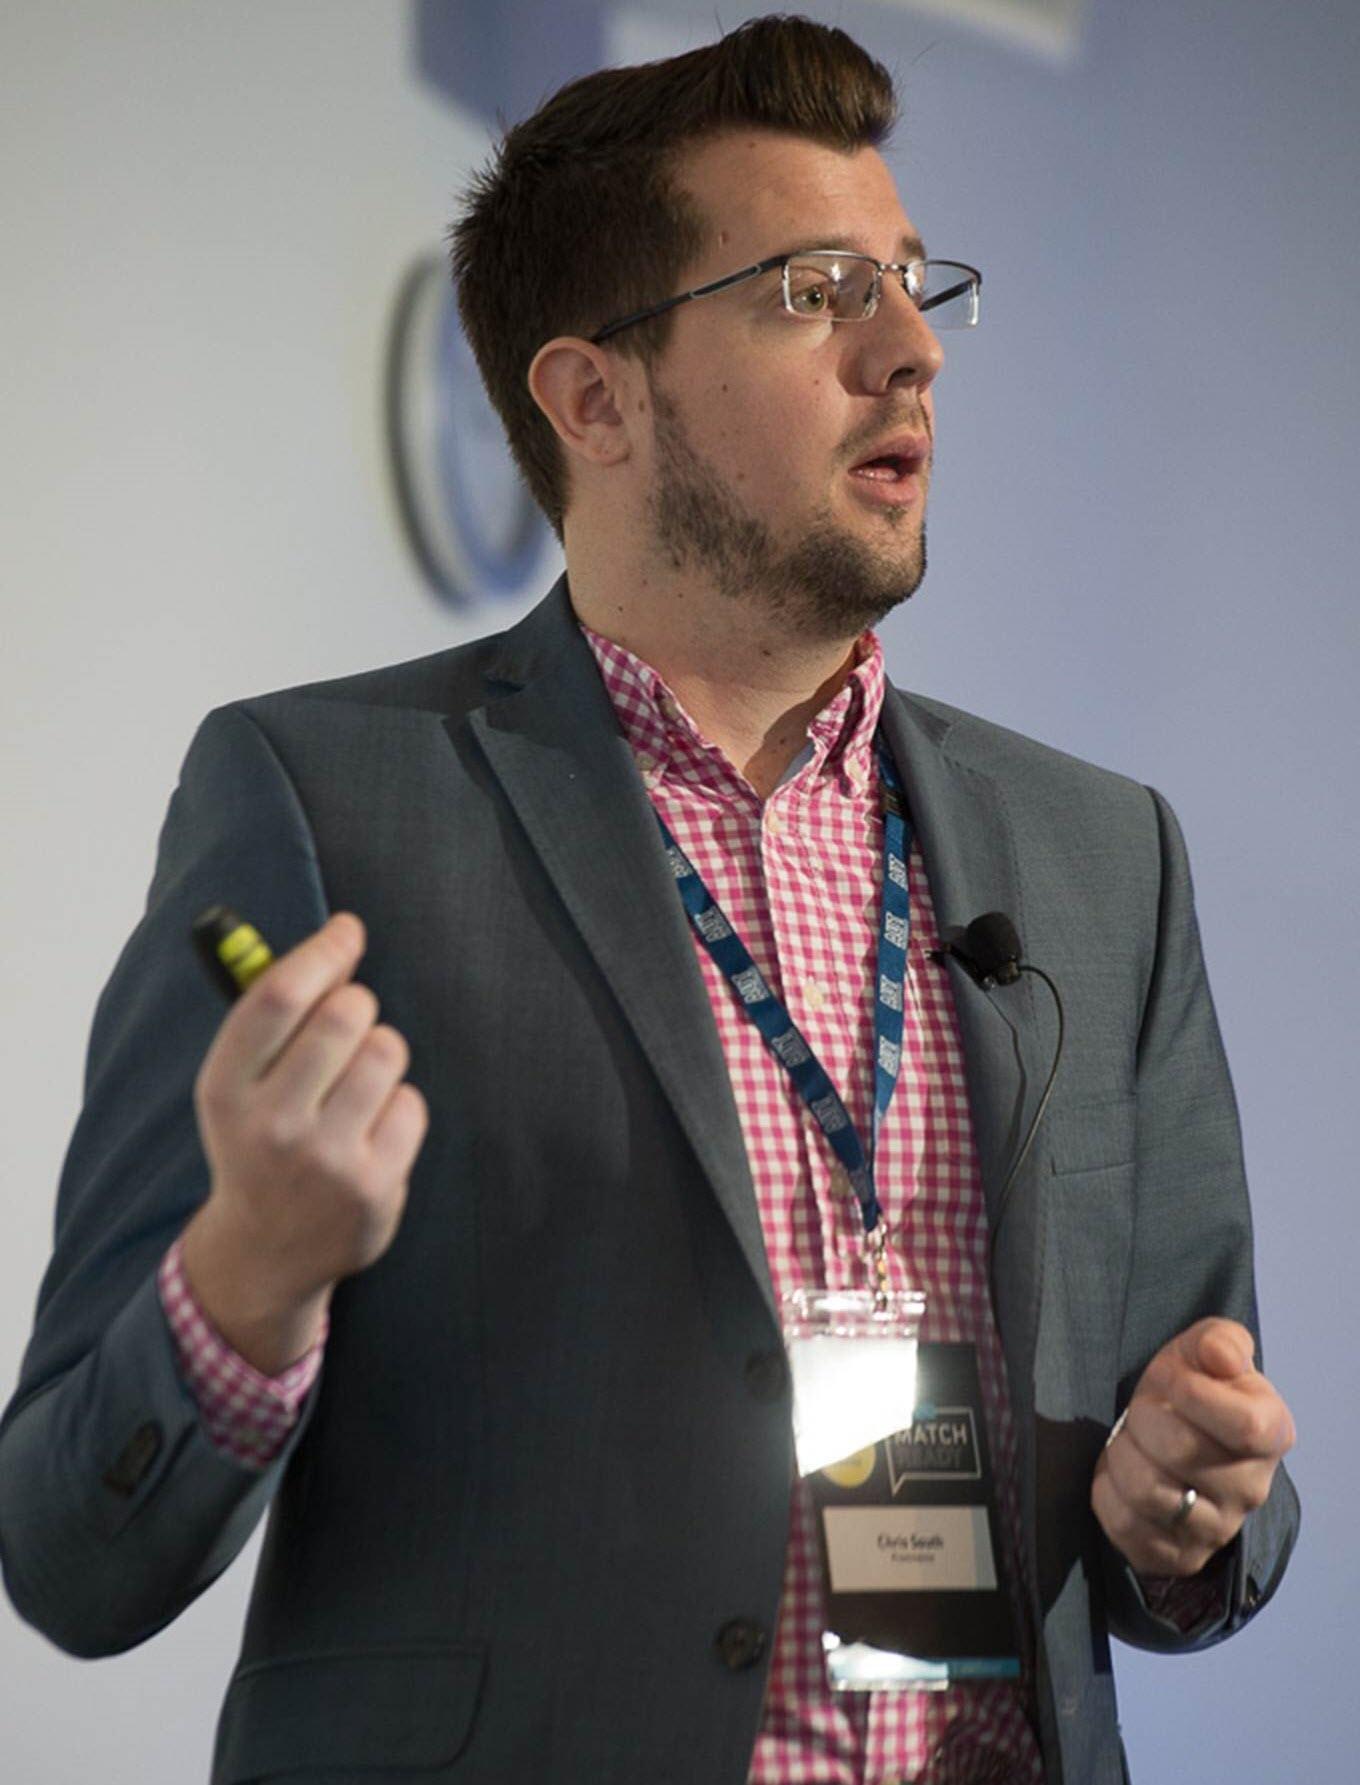 Chris South - Keynote Speaker - Marketing Automation